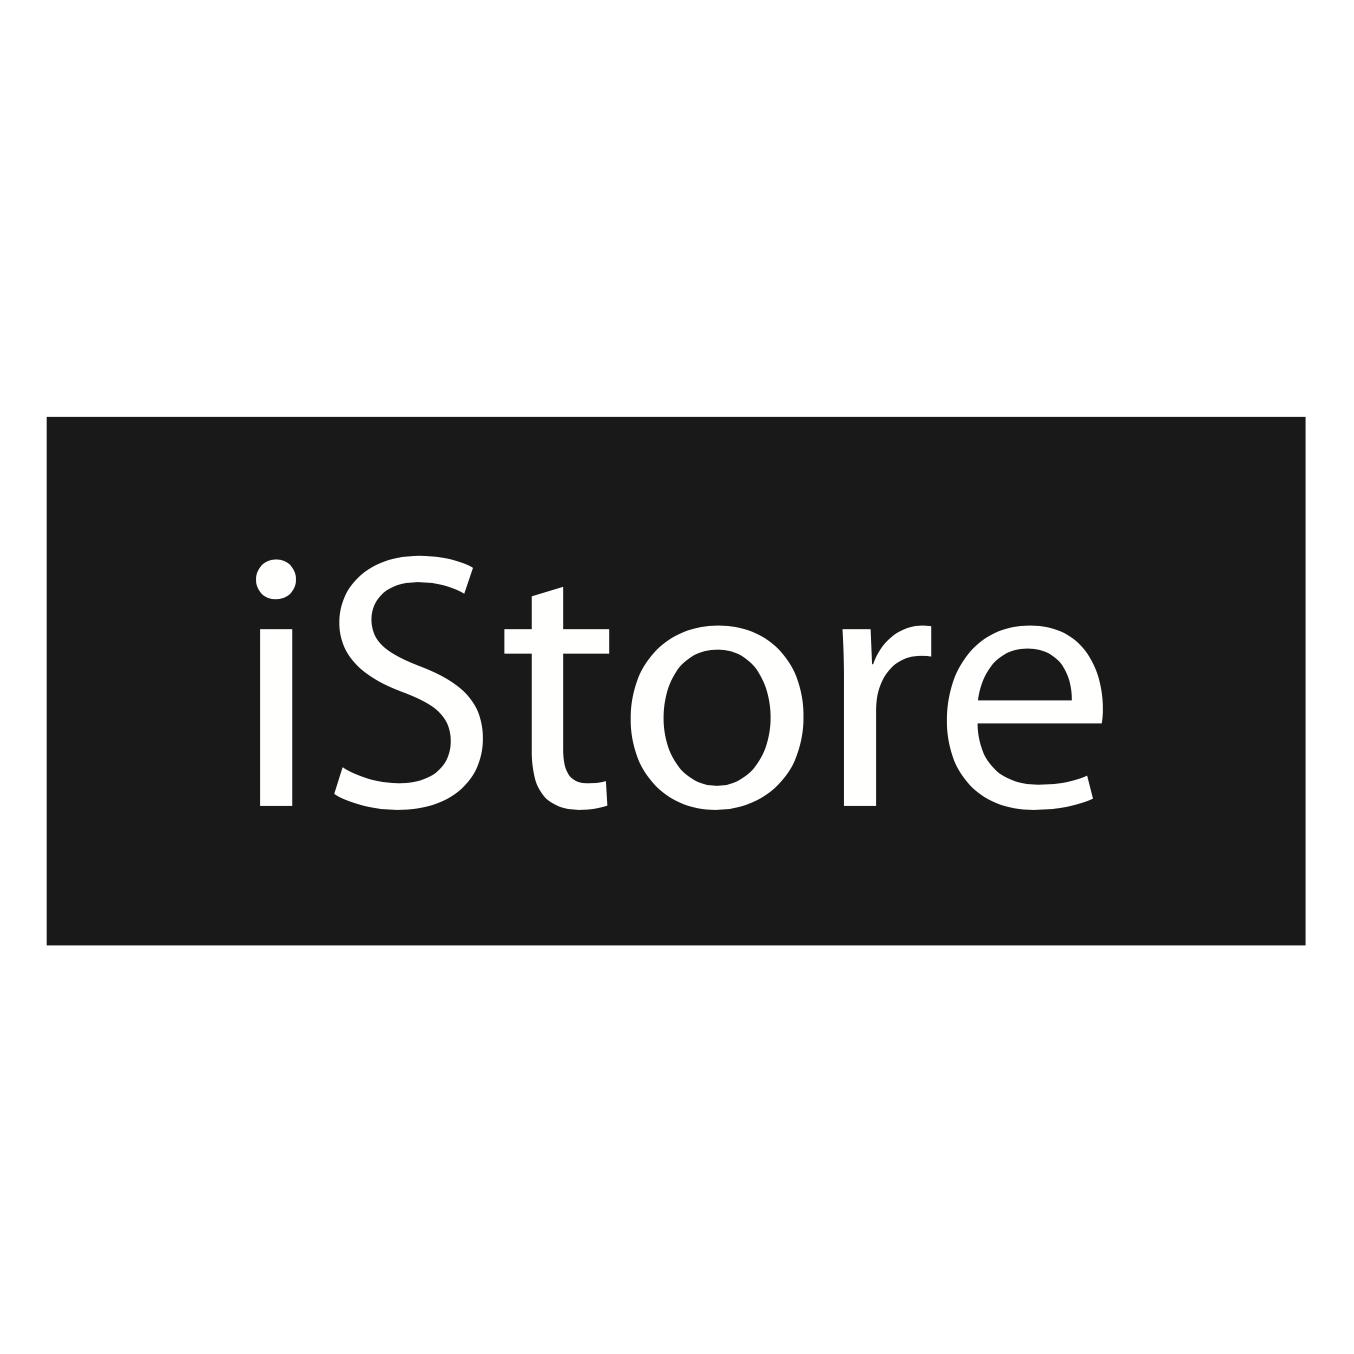 iPad mini 2 Wi-Fi + Cellular 16GB - Silver